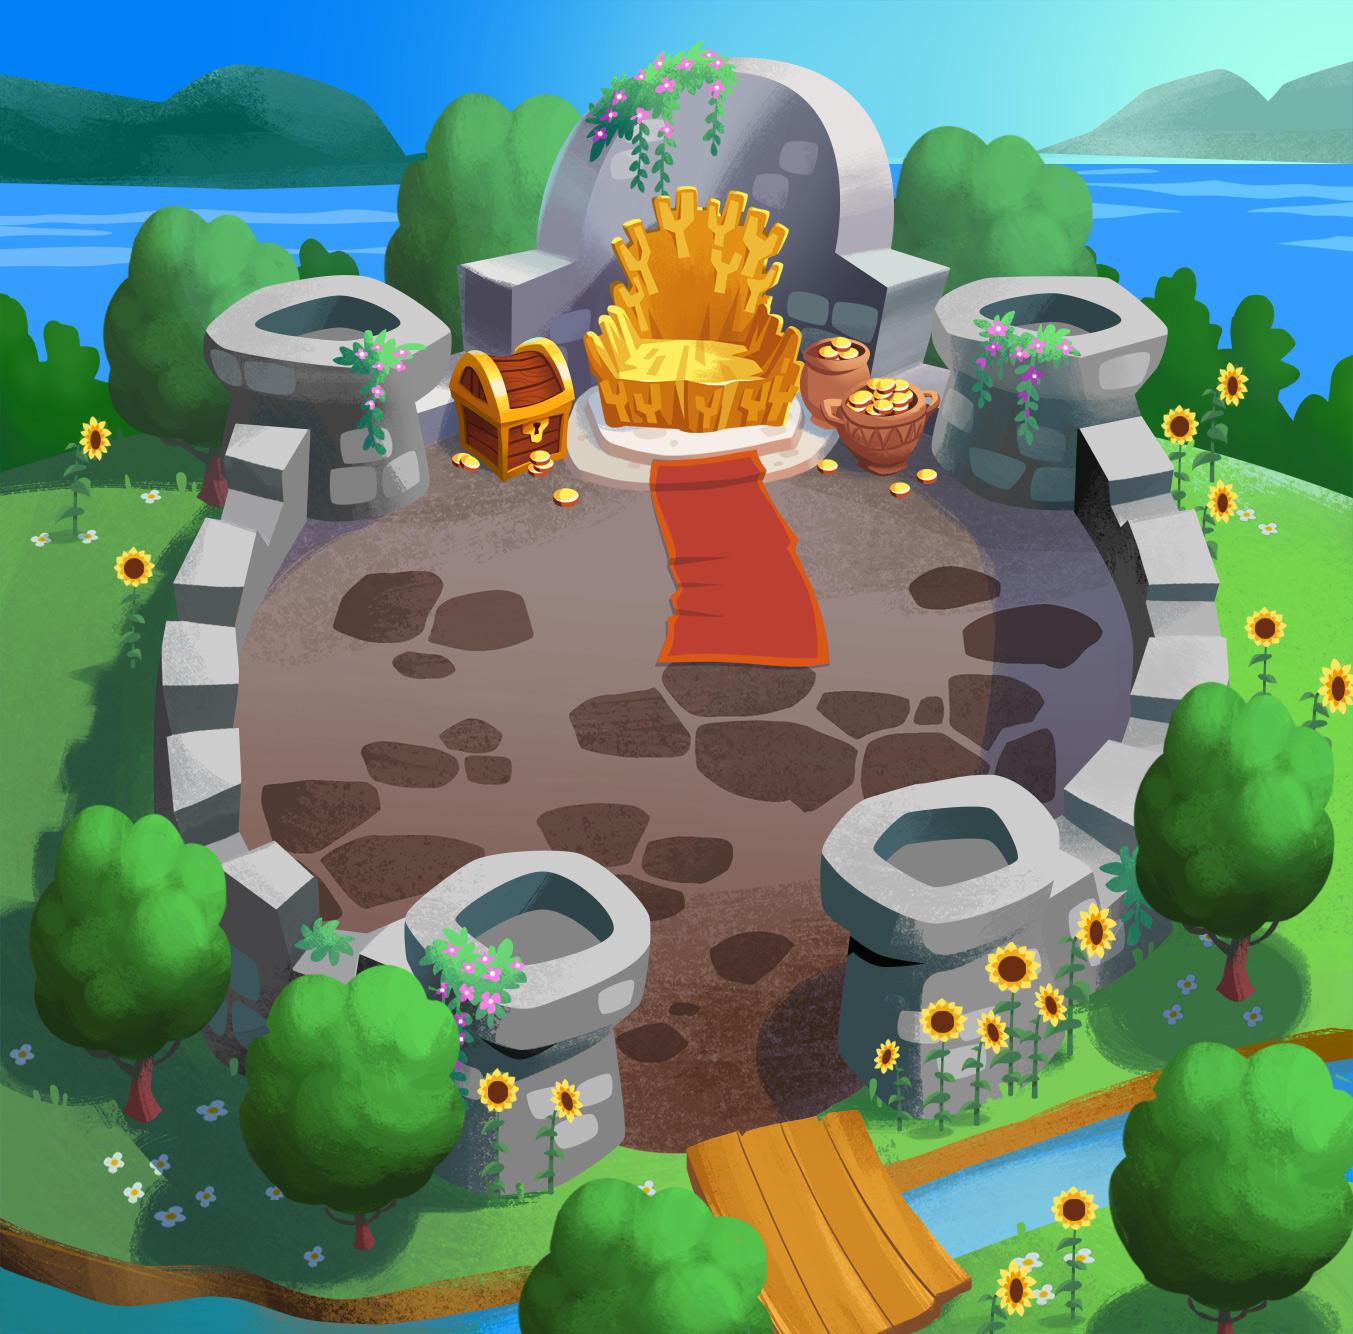 Throne Rush Map by jjnaas